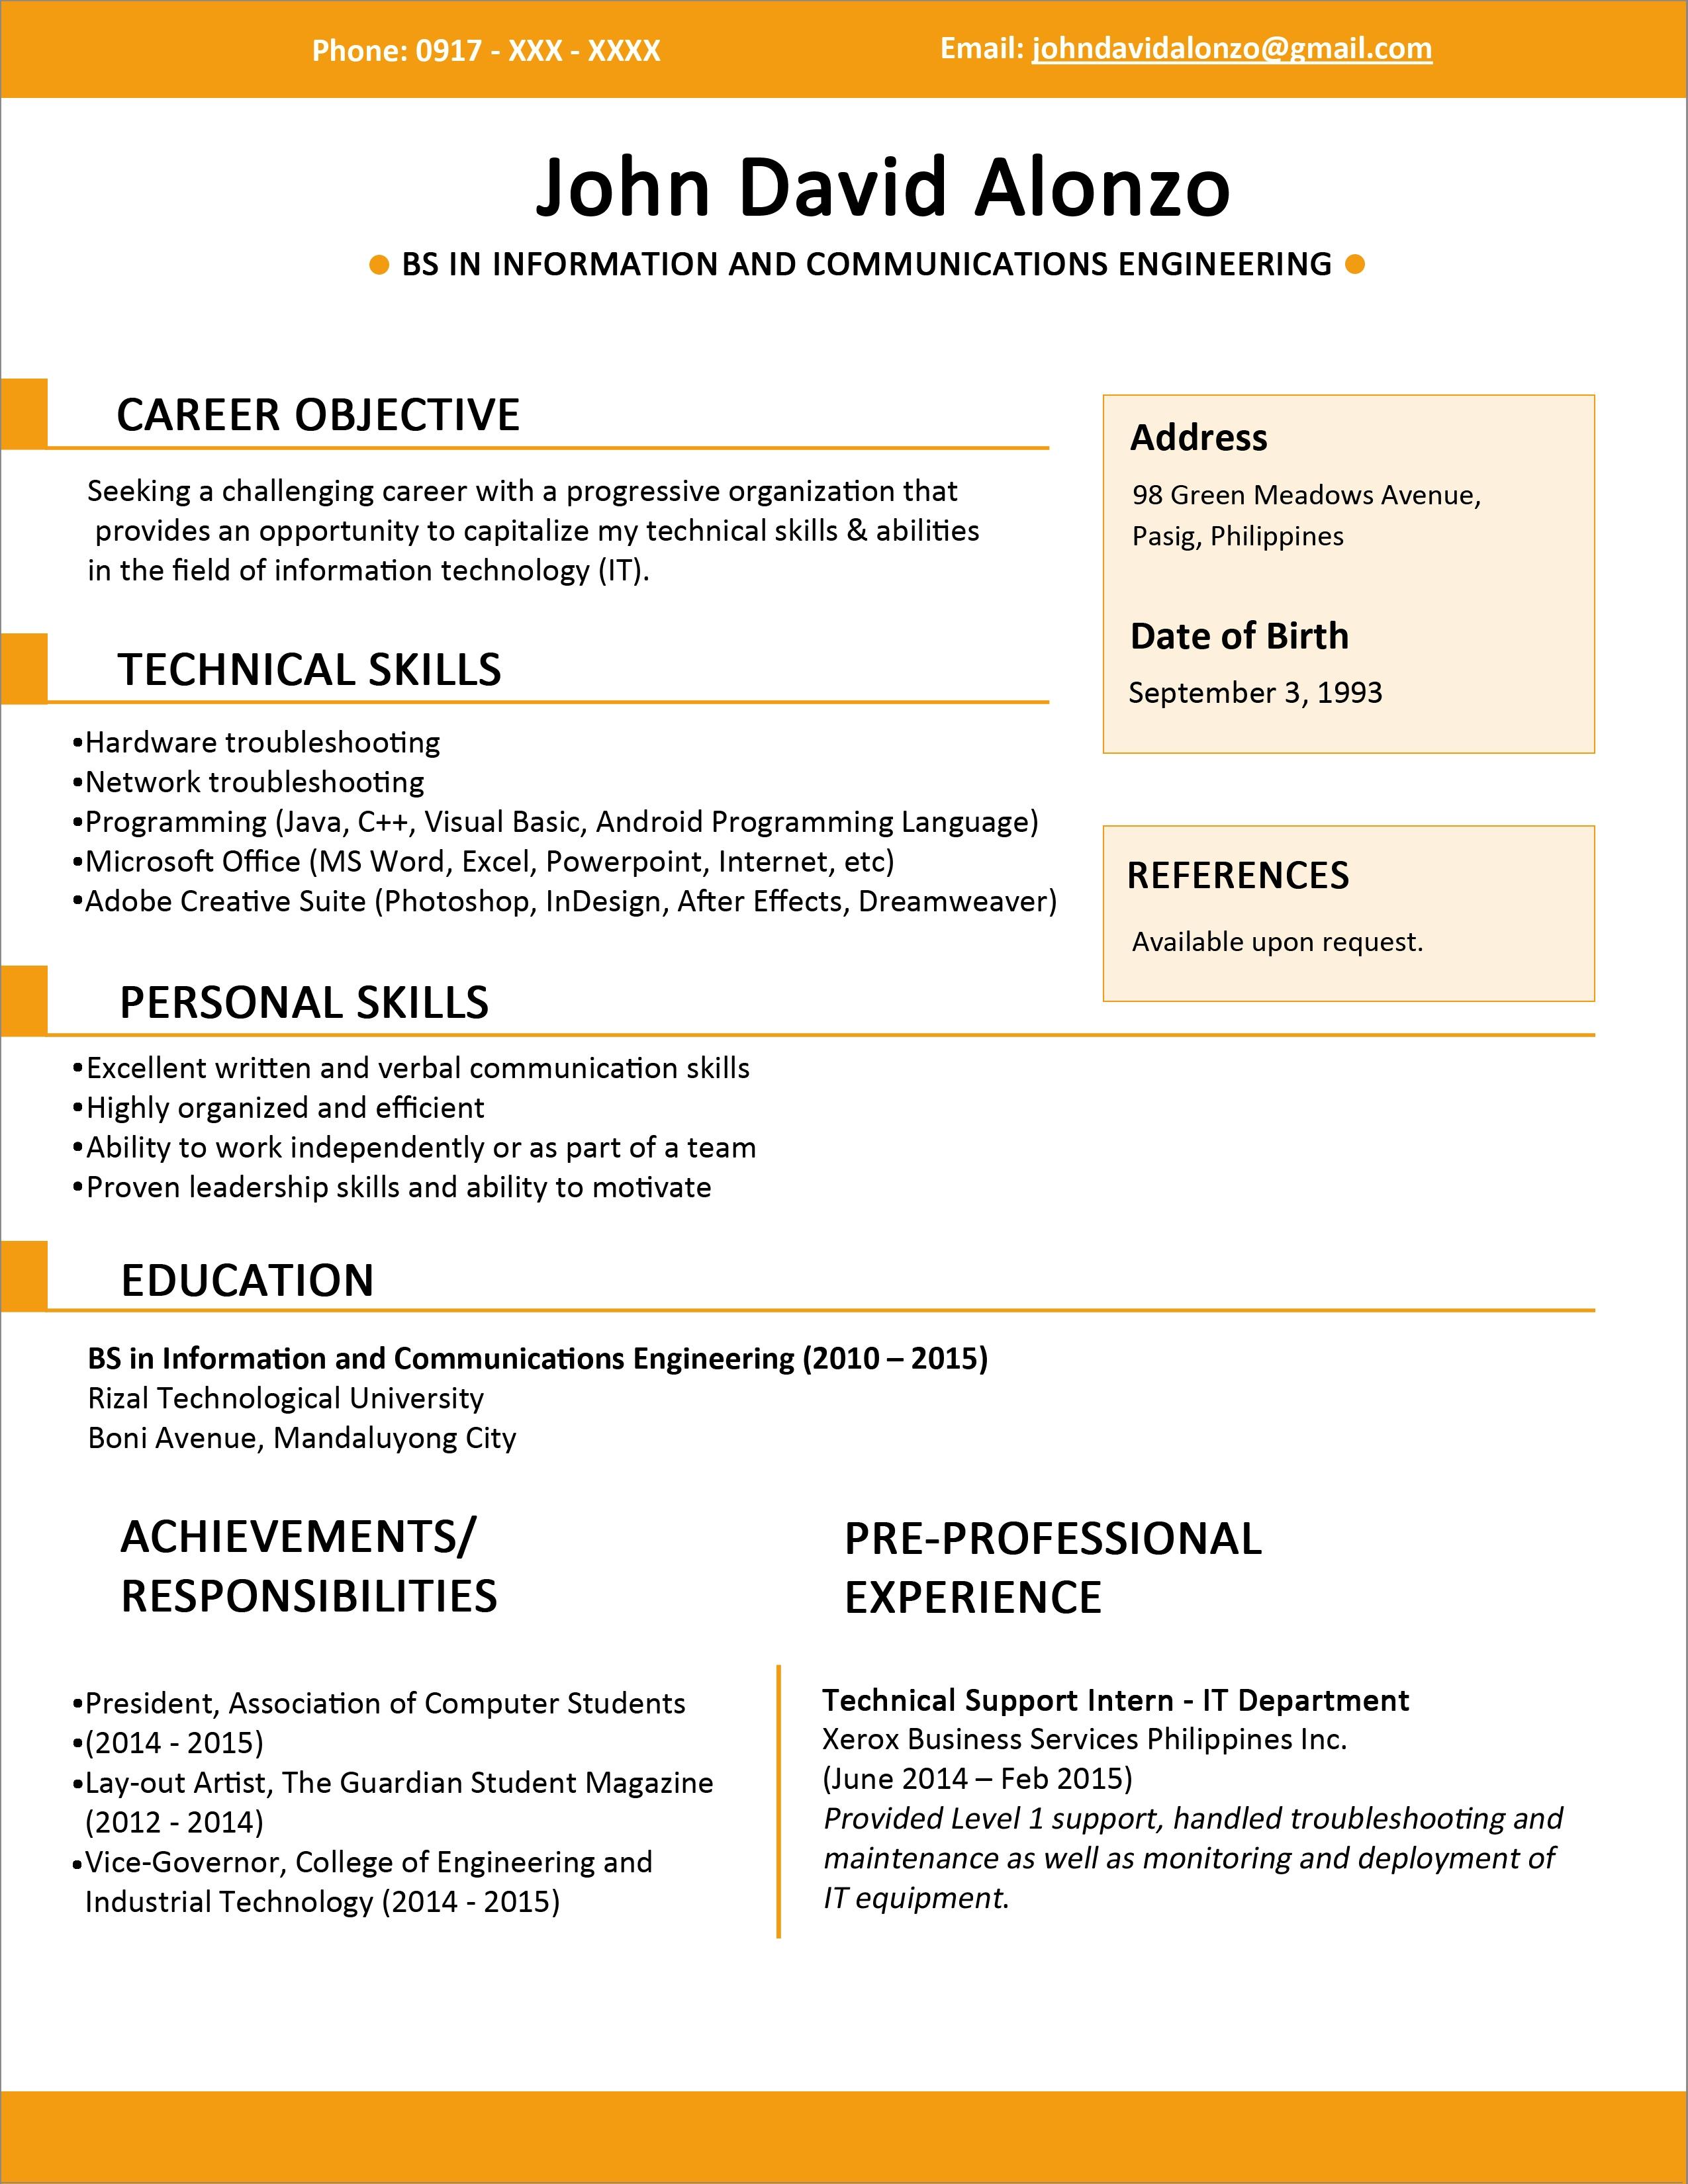 create resume free download